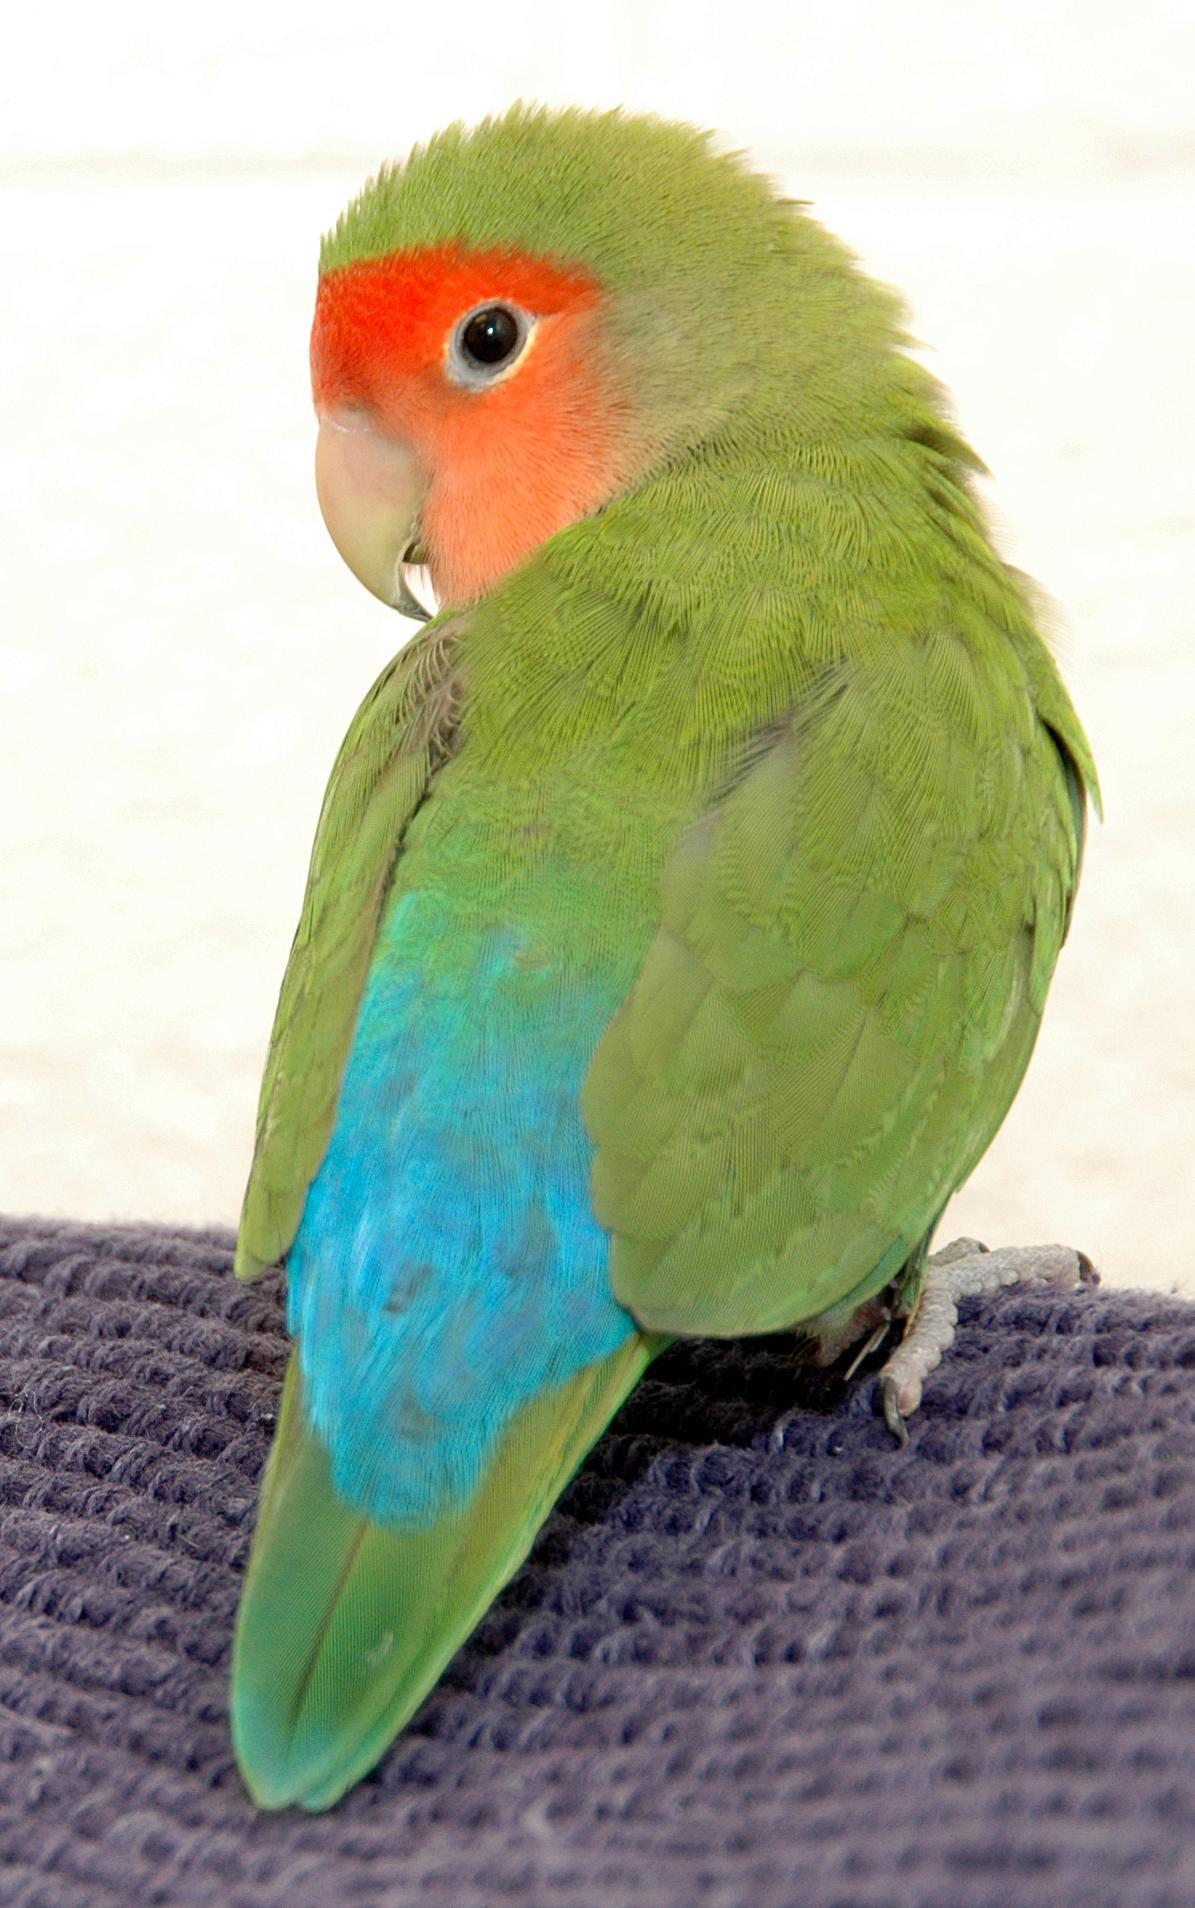 Fkirty Bird portrait